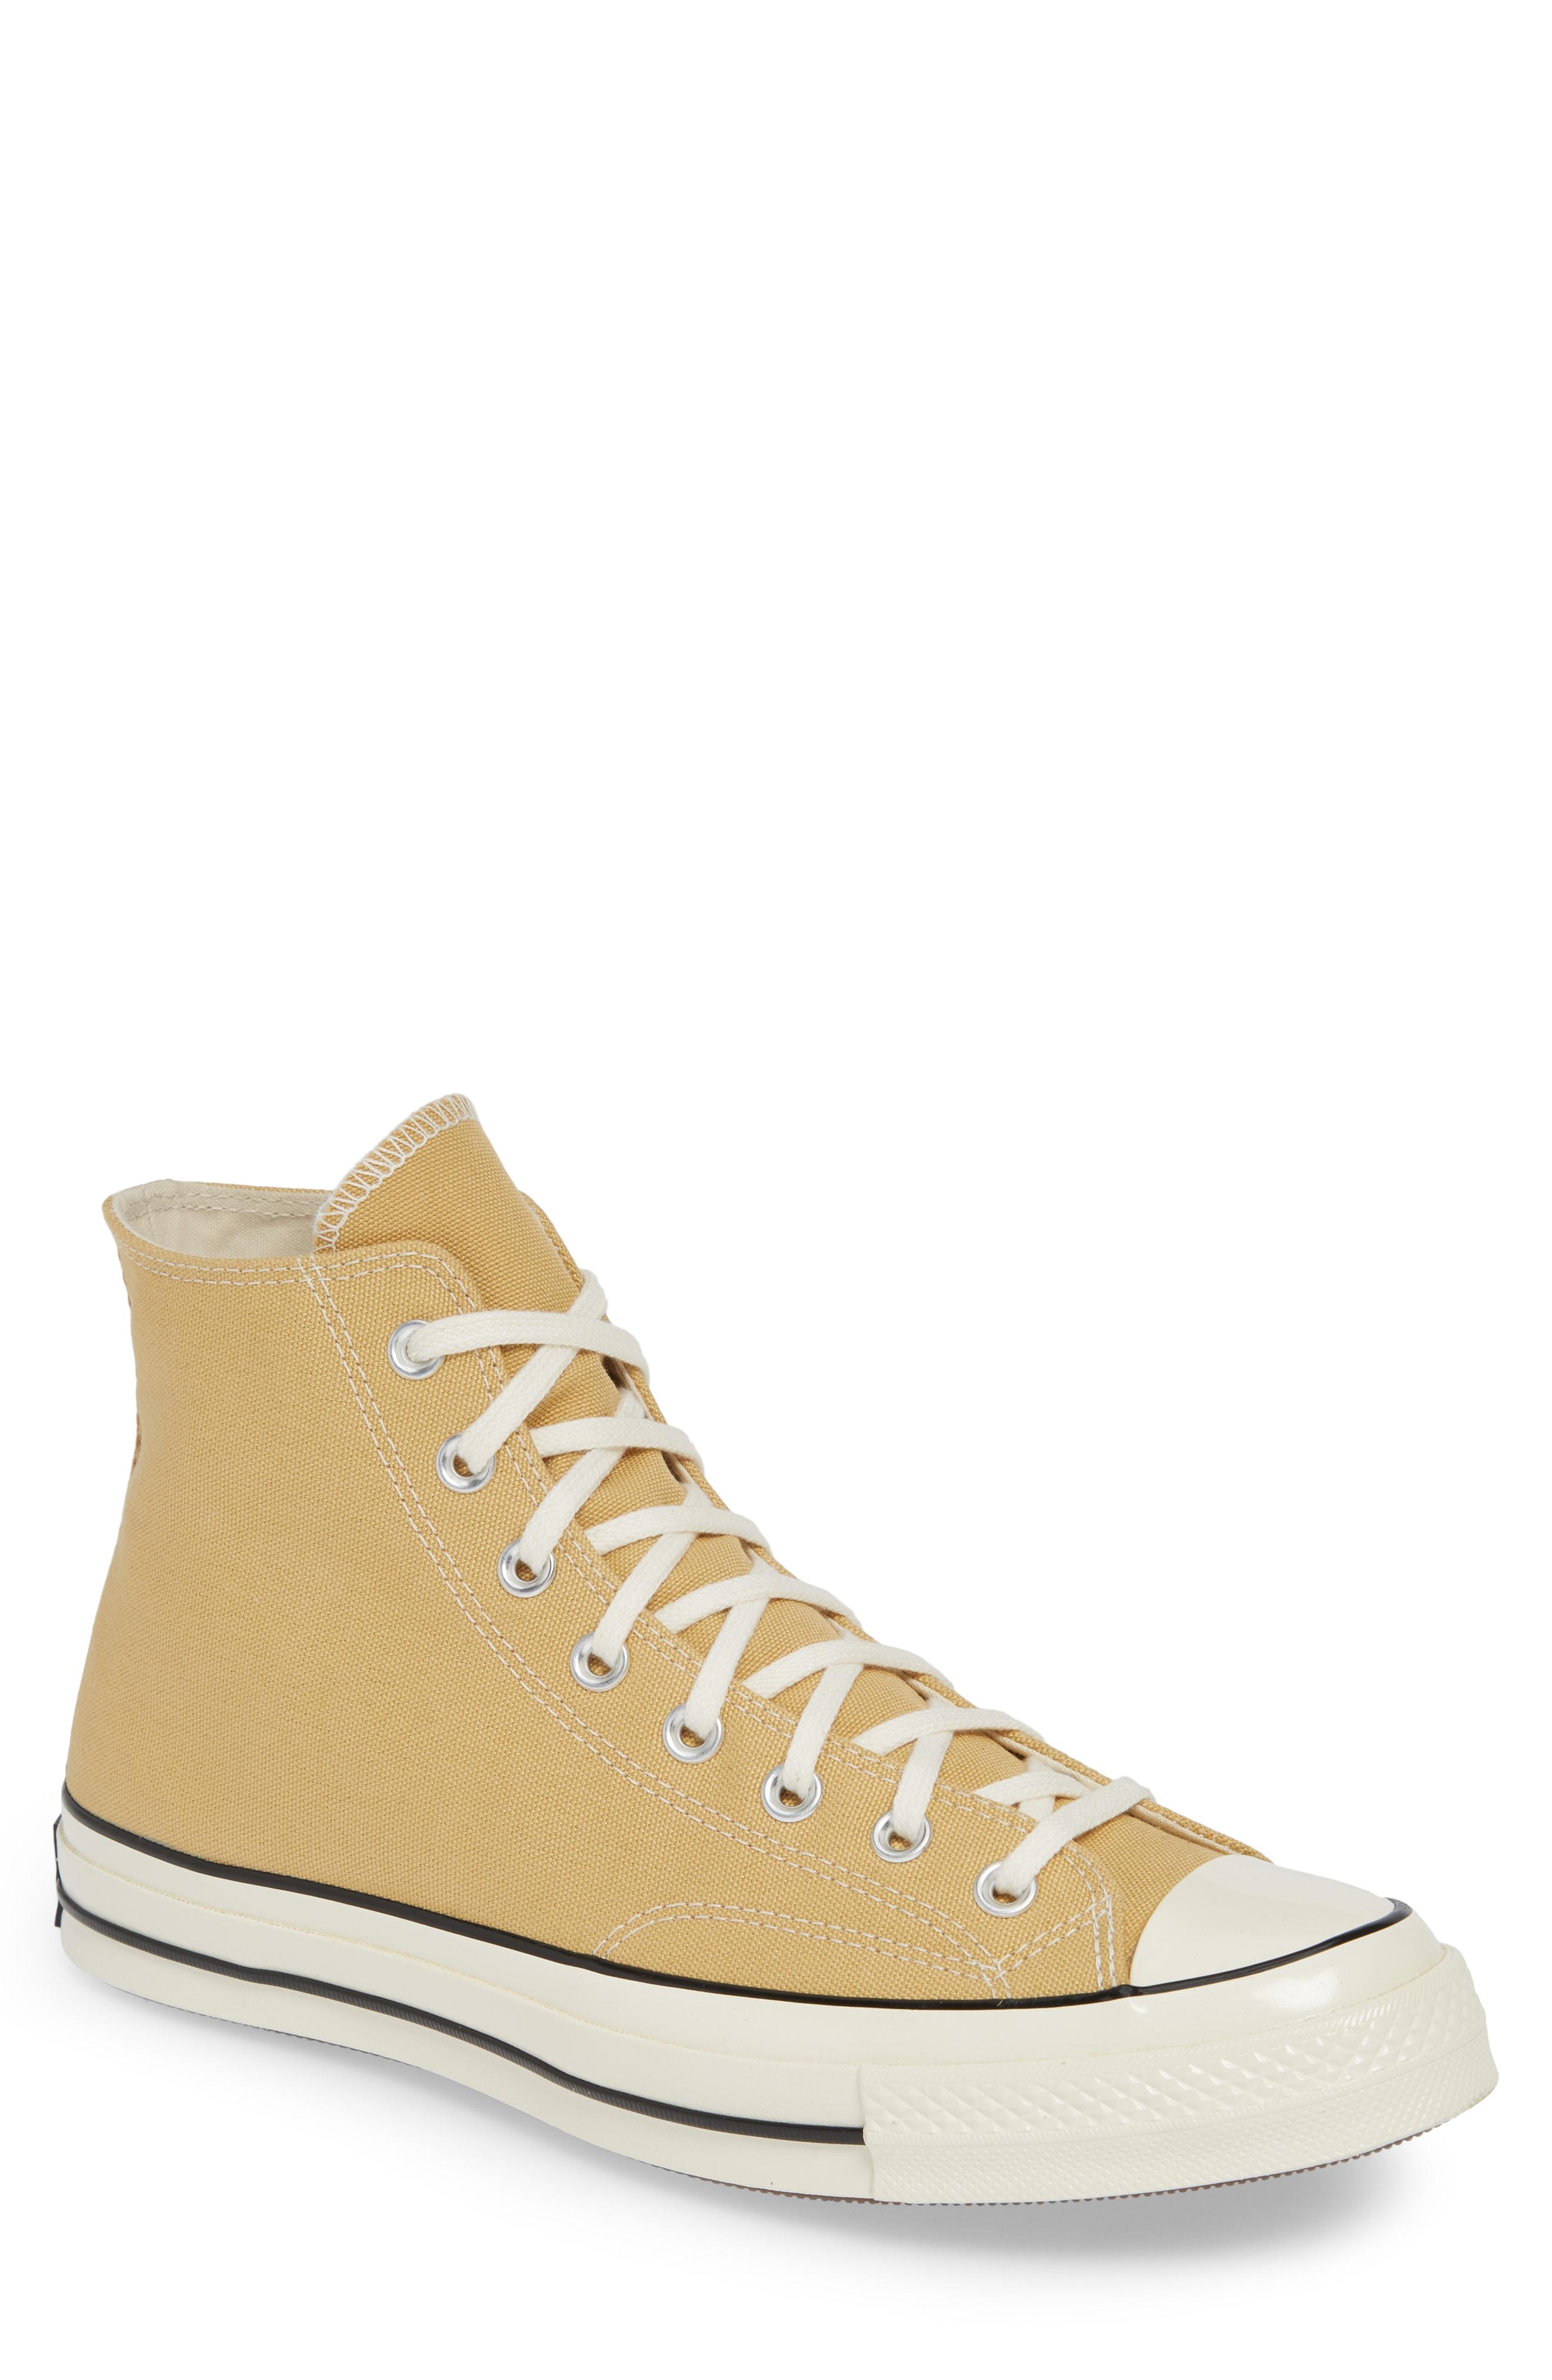 4ae89a9c4948 Converse Chuck Taylor All Star 70 High Top Sneaker In Club Gold  Black